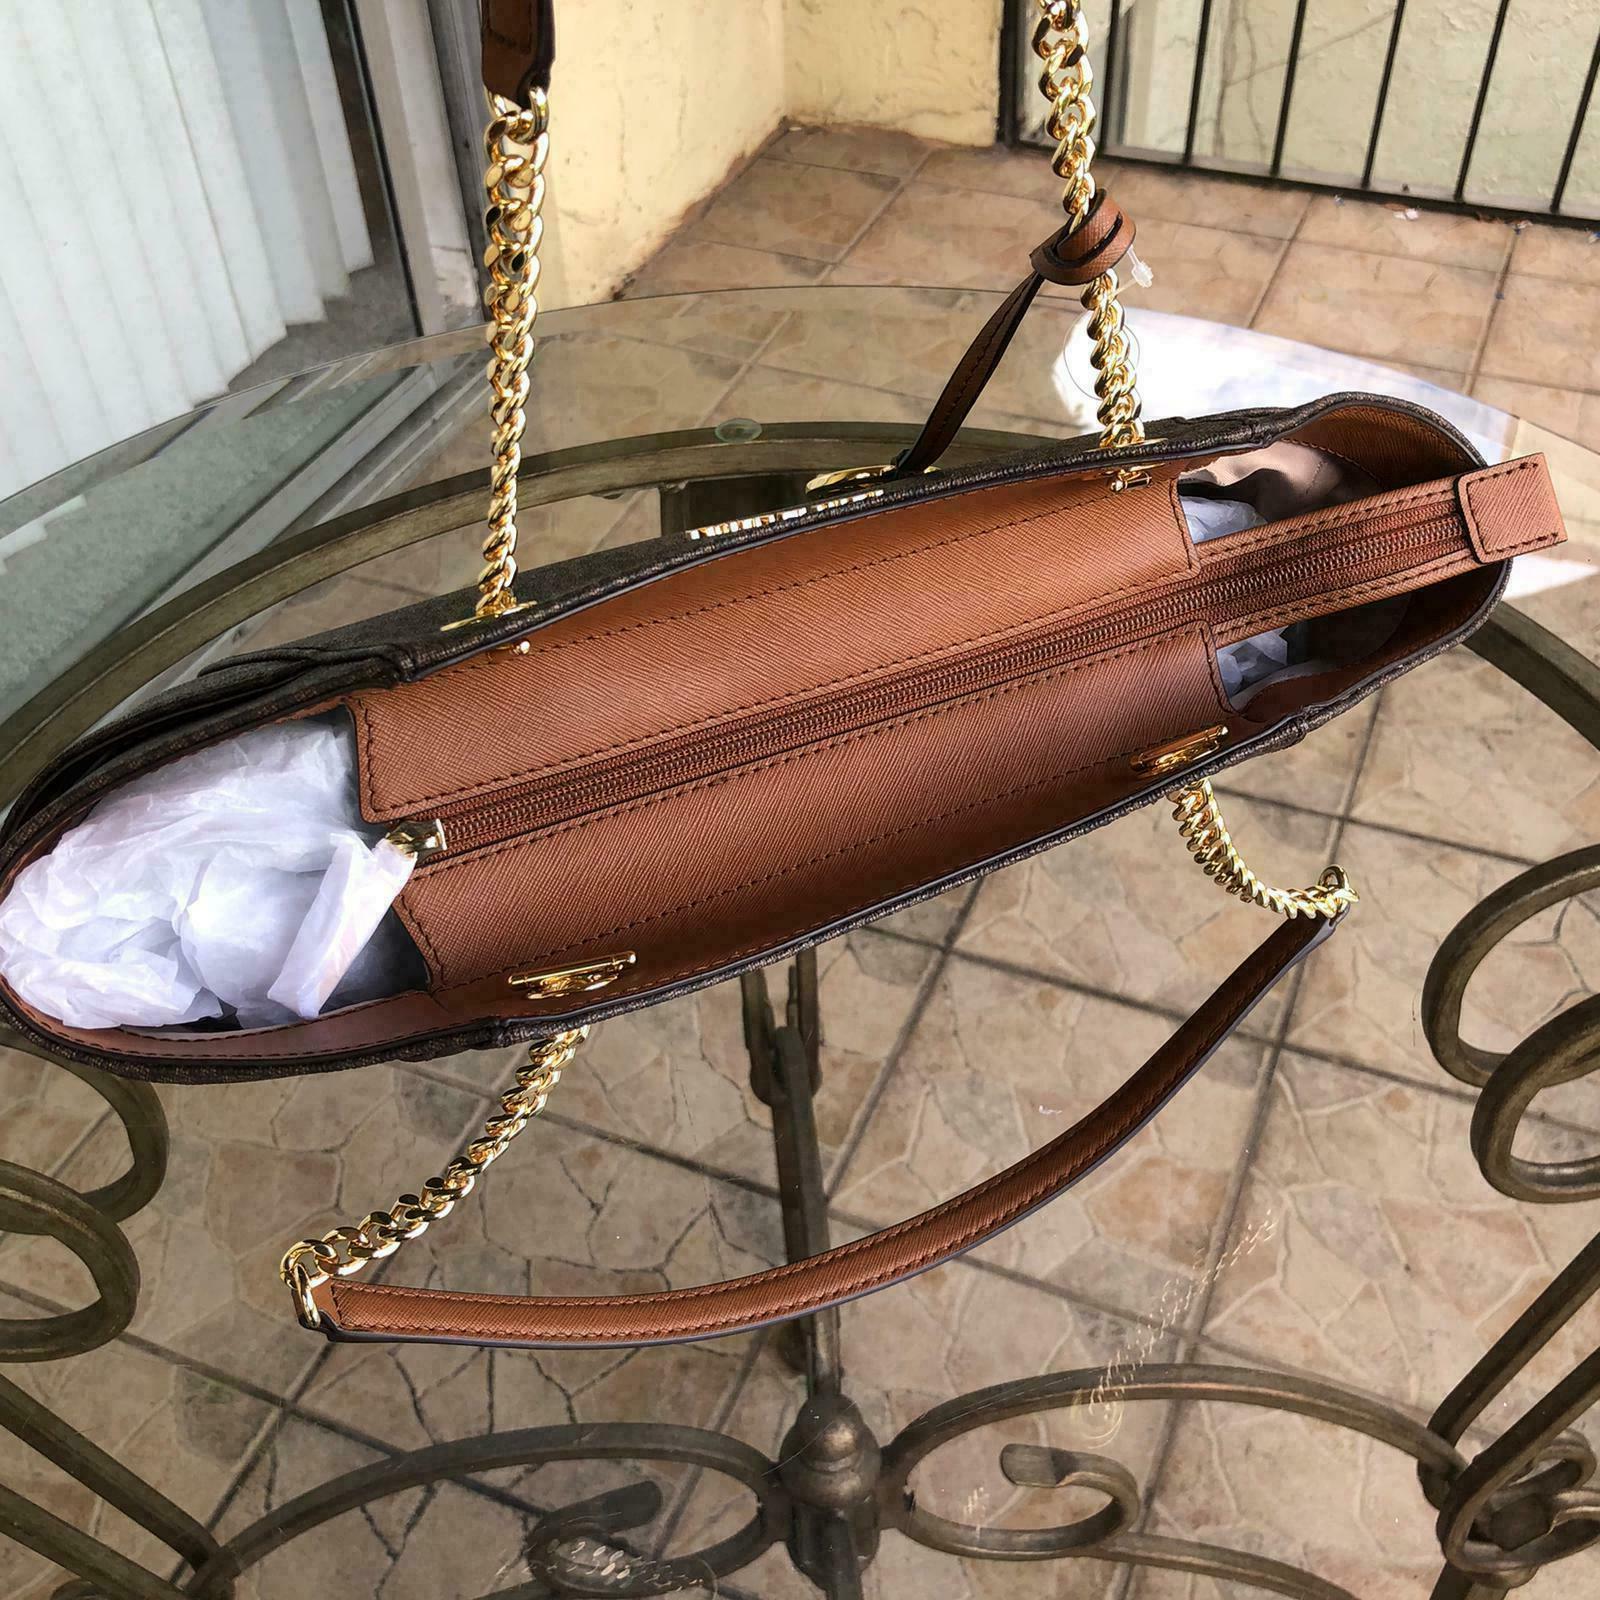 Michael Kors Shoulder Tote Purse Handbag Messenger MK